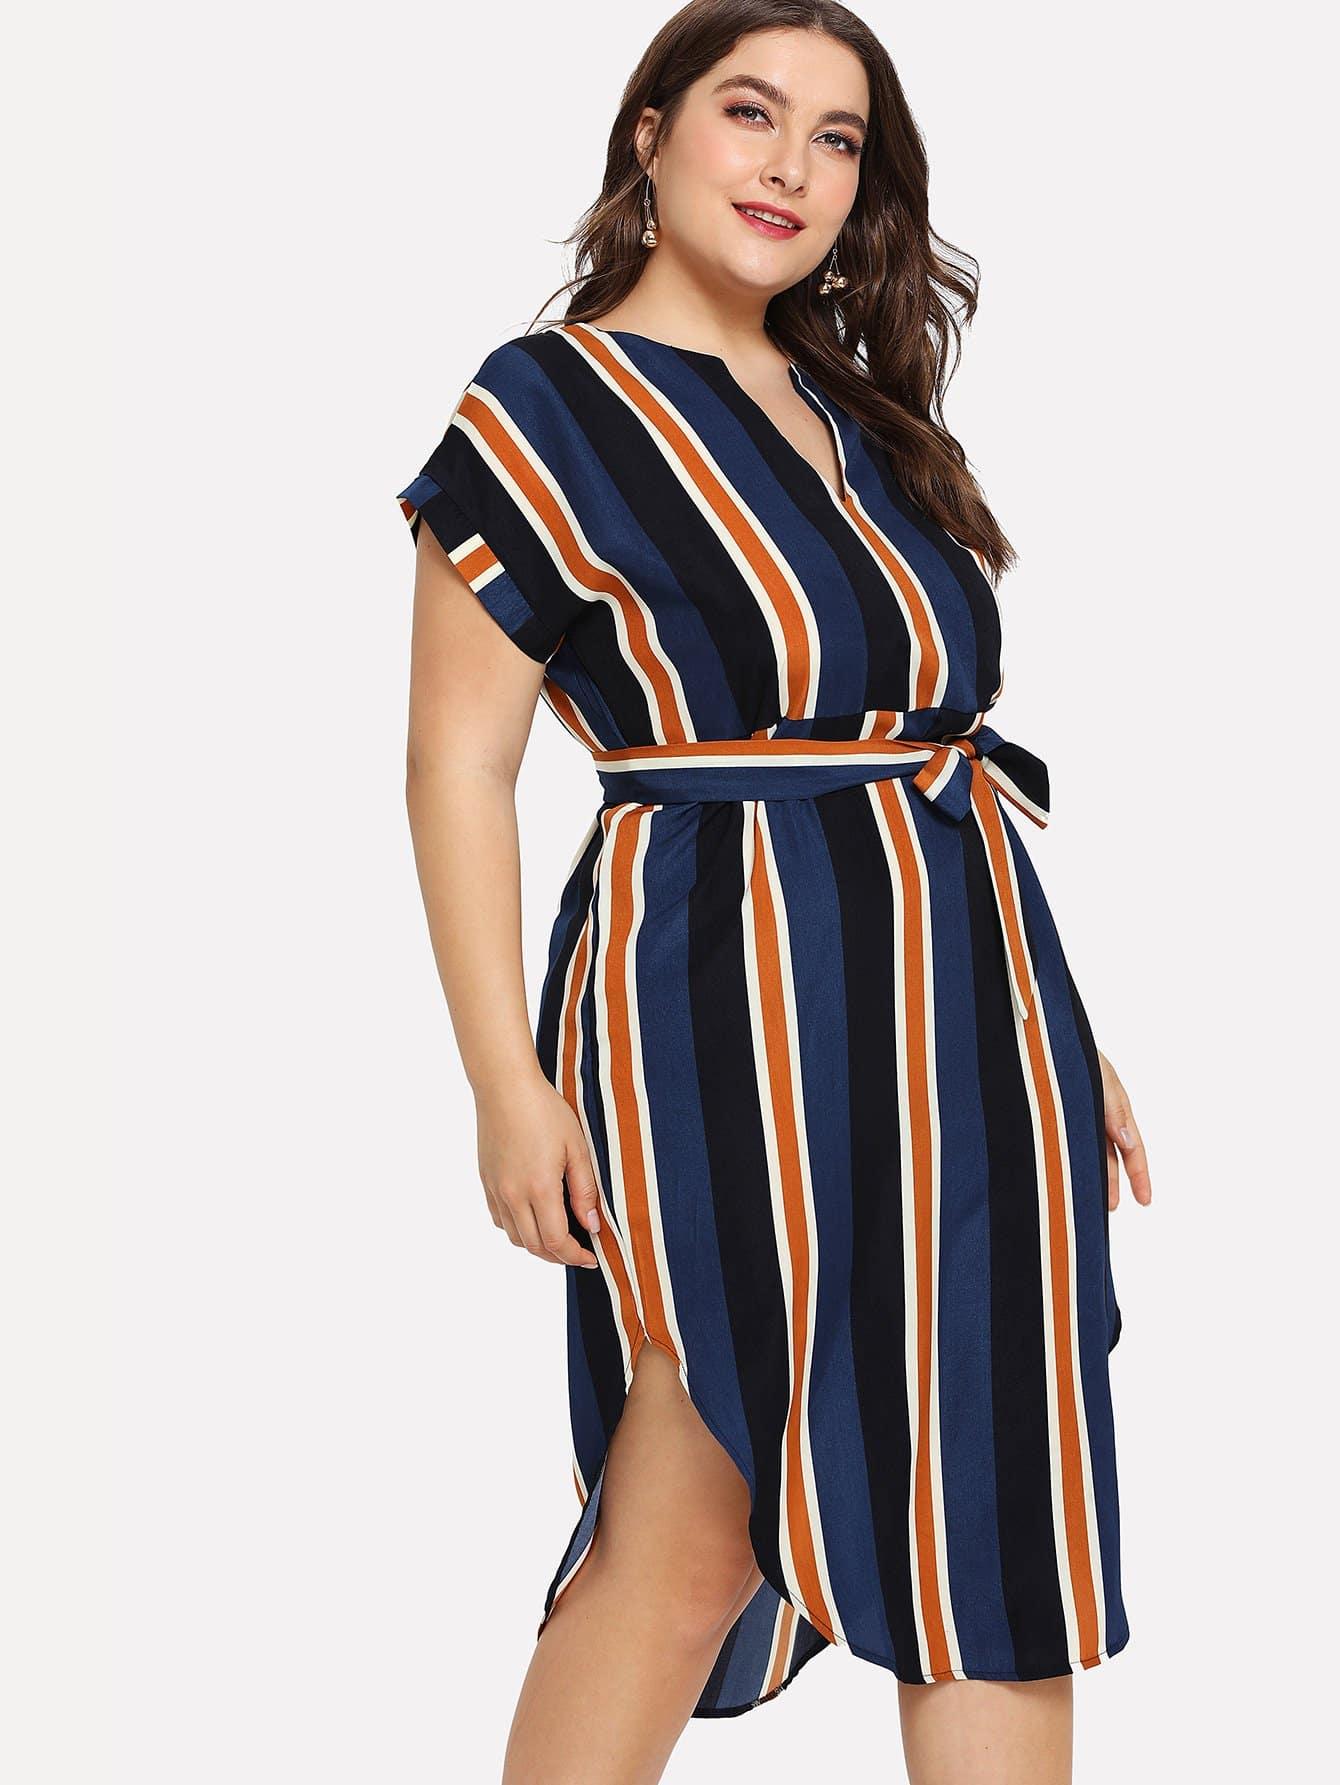 Curved Hem Tie Waist Striped Dress batwing sleeve pocket side curved hem textured dress